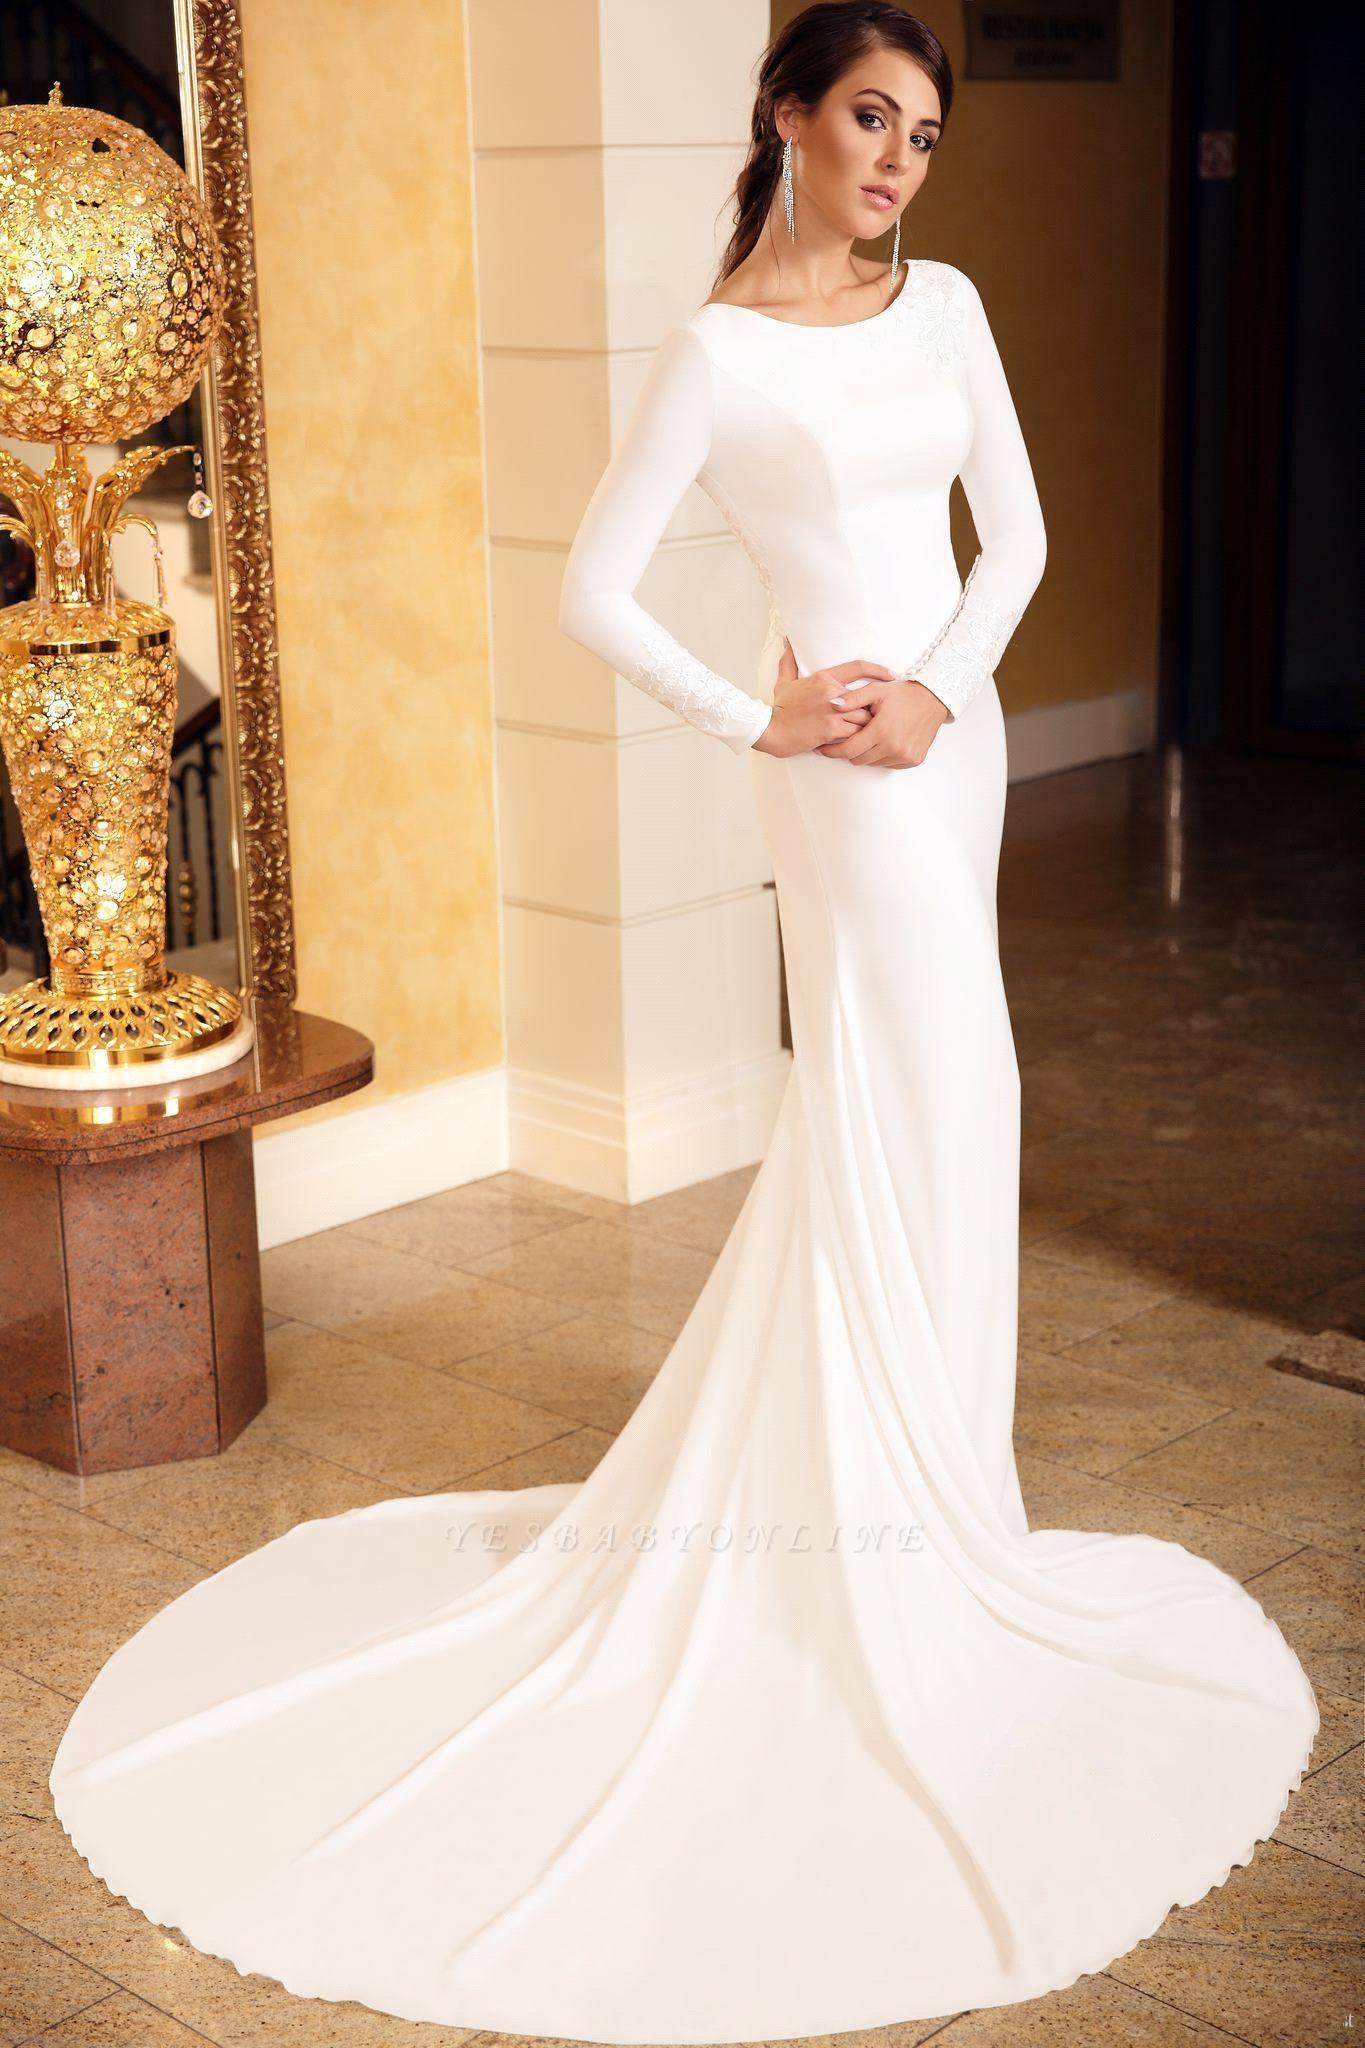 Elegant Sleek White Lace Mermaid Prom Dresses With Long Sleeves